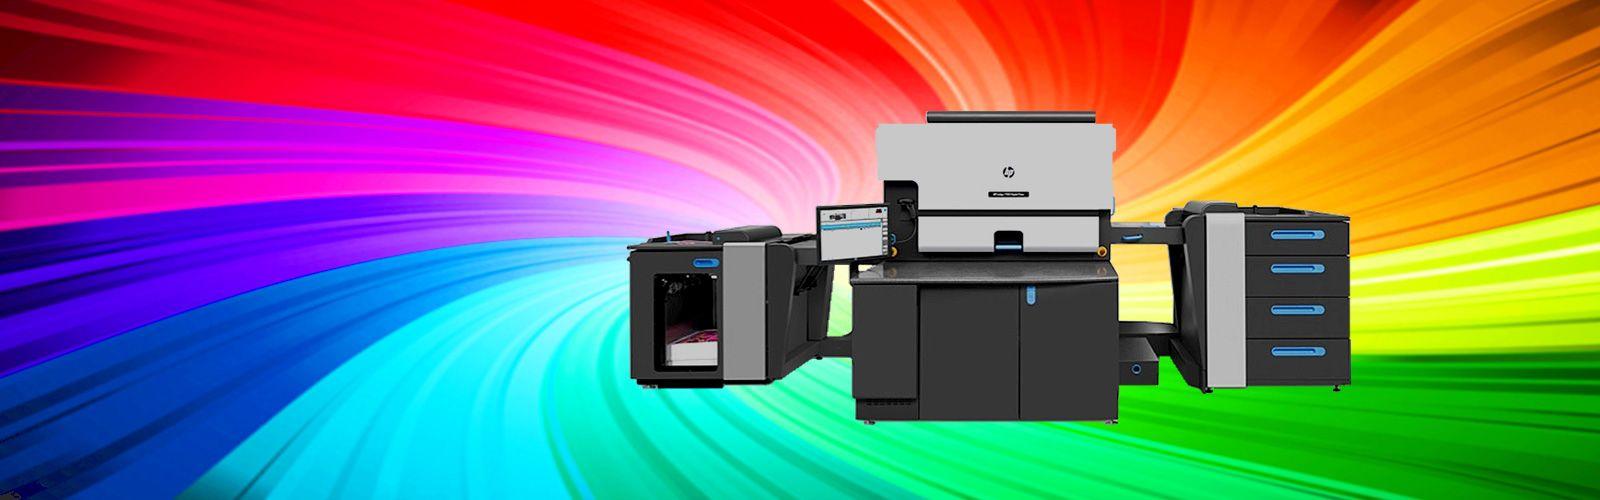 HP Indigo Digital Printing